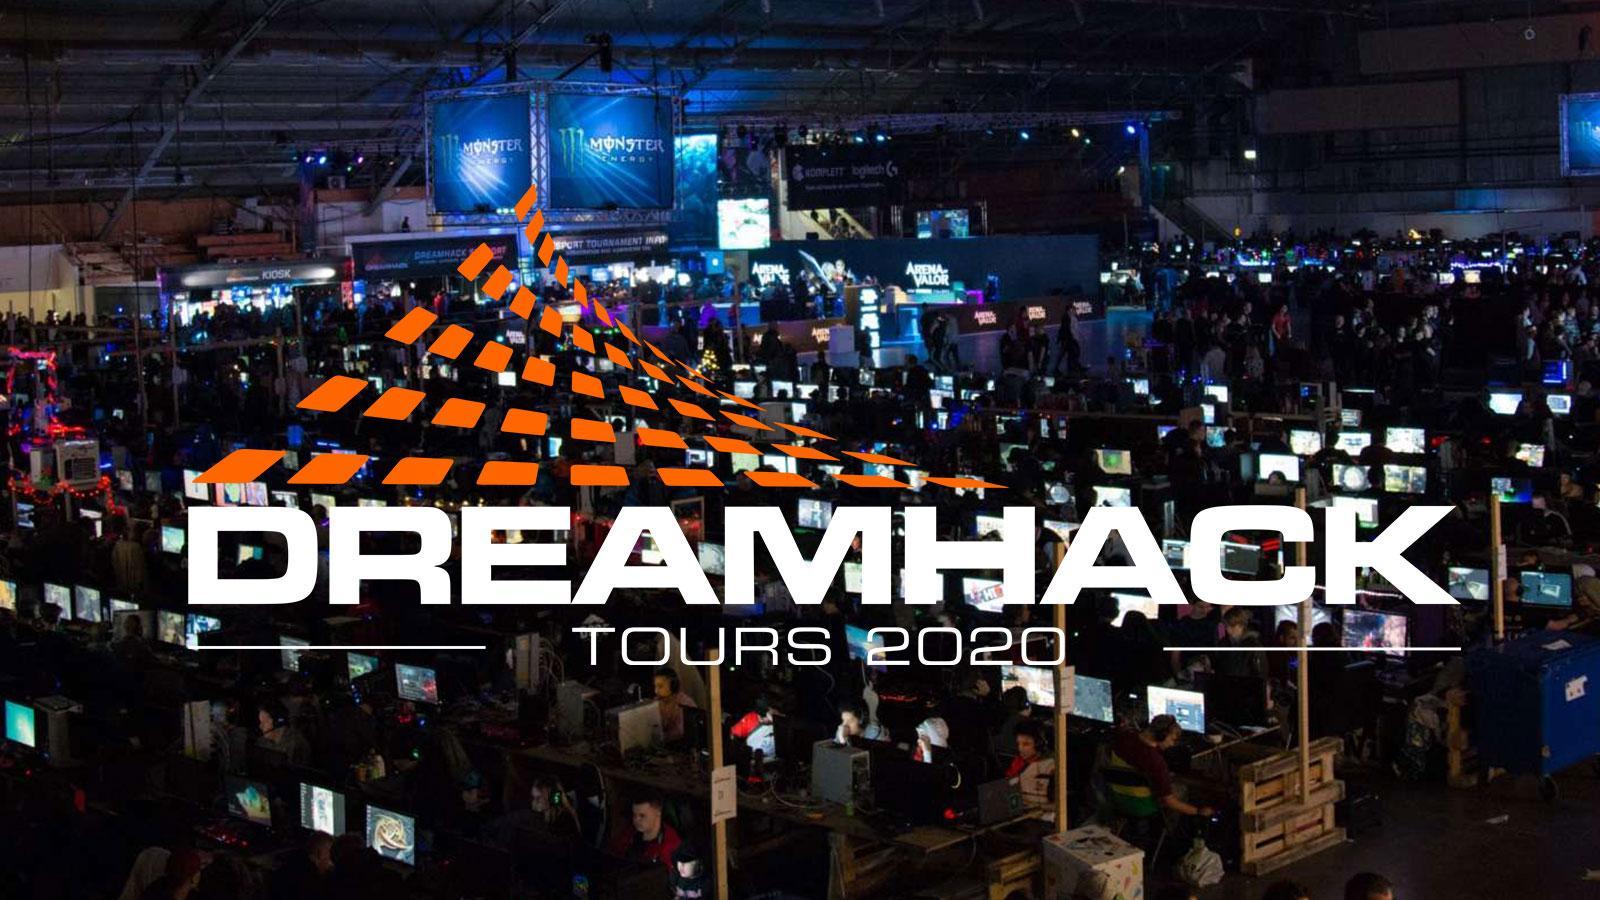 DreamHack Tours 2020